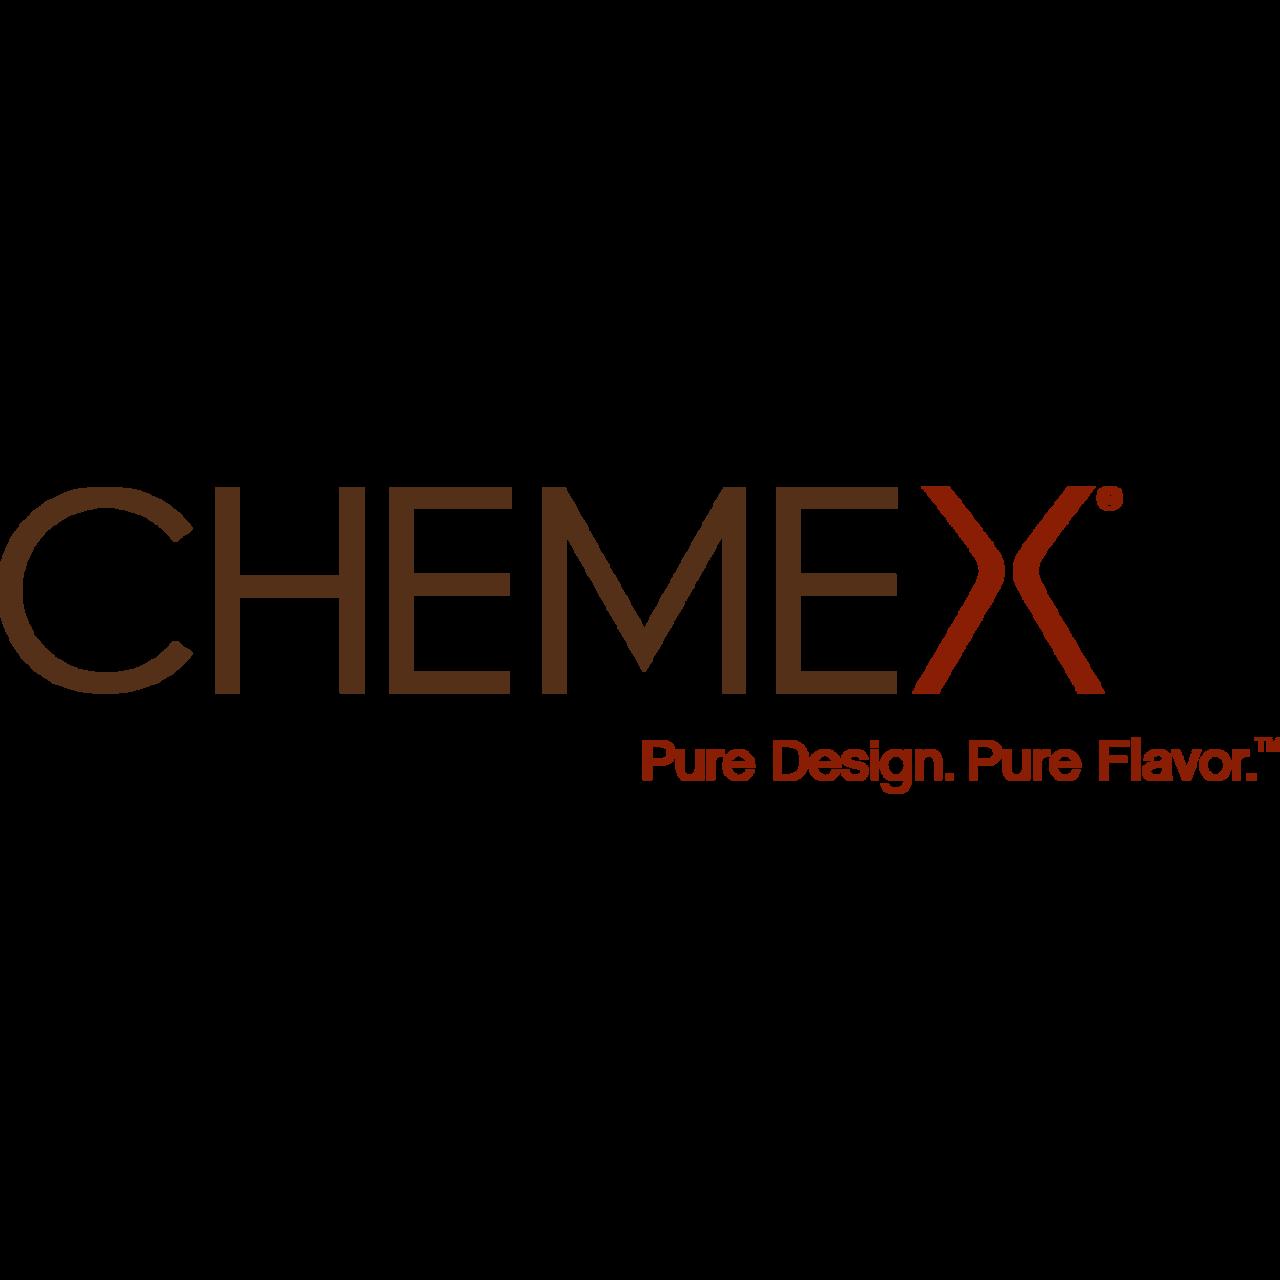 Chemex_Logo1400x1400_1280x1280.png